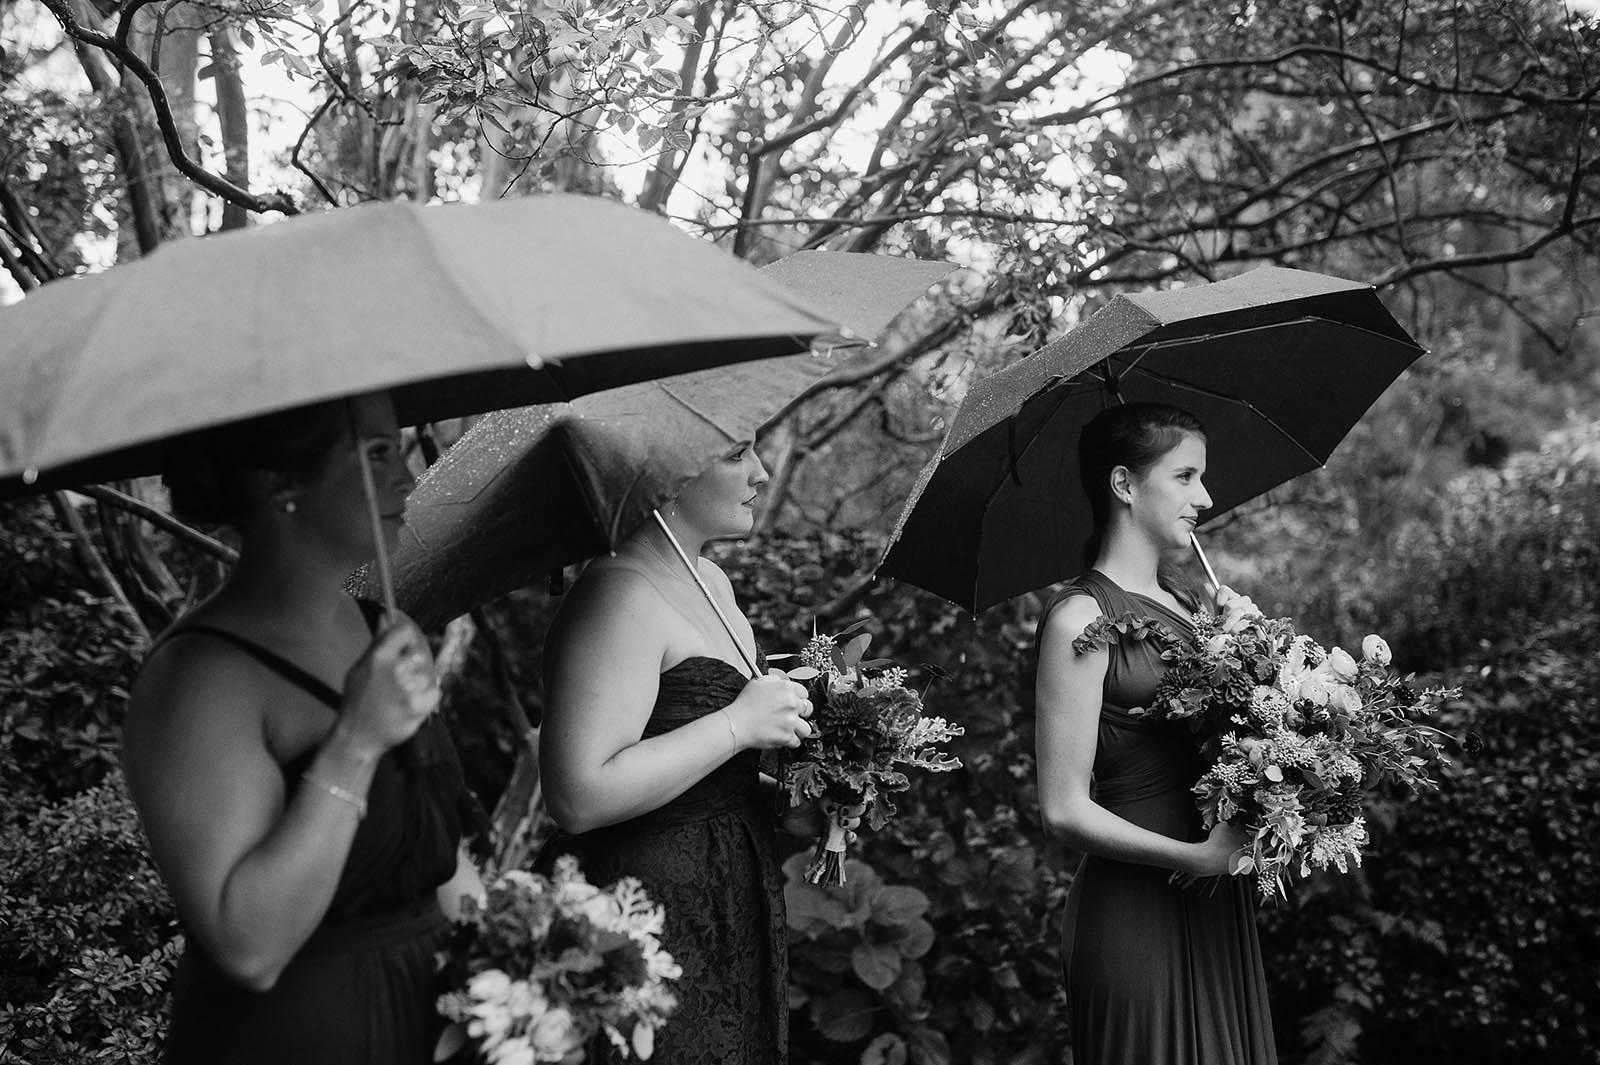 Bridesmaids with umbrellas at a rainy Crystal Springs Rhododendron Garden wedding ceremony